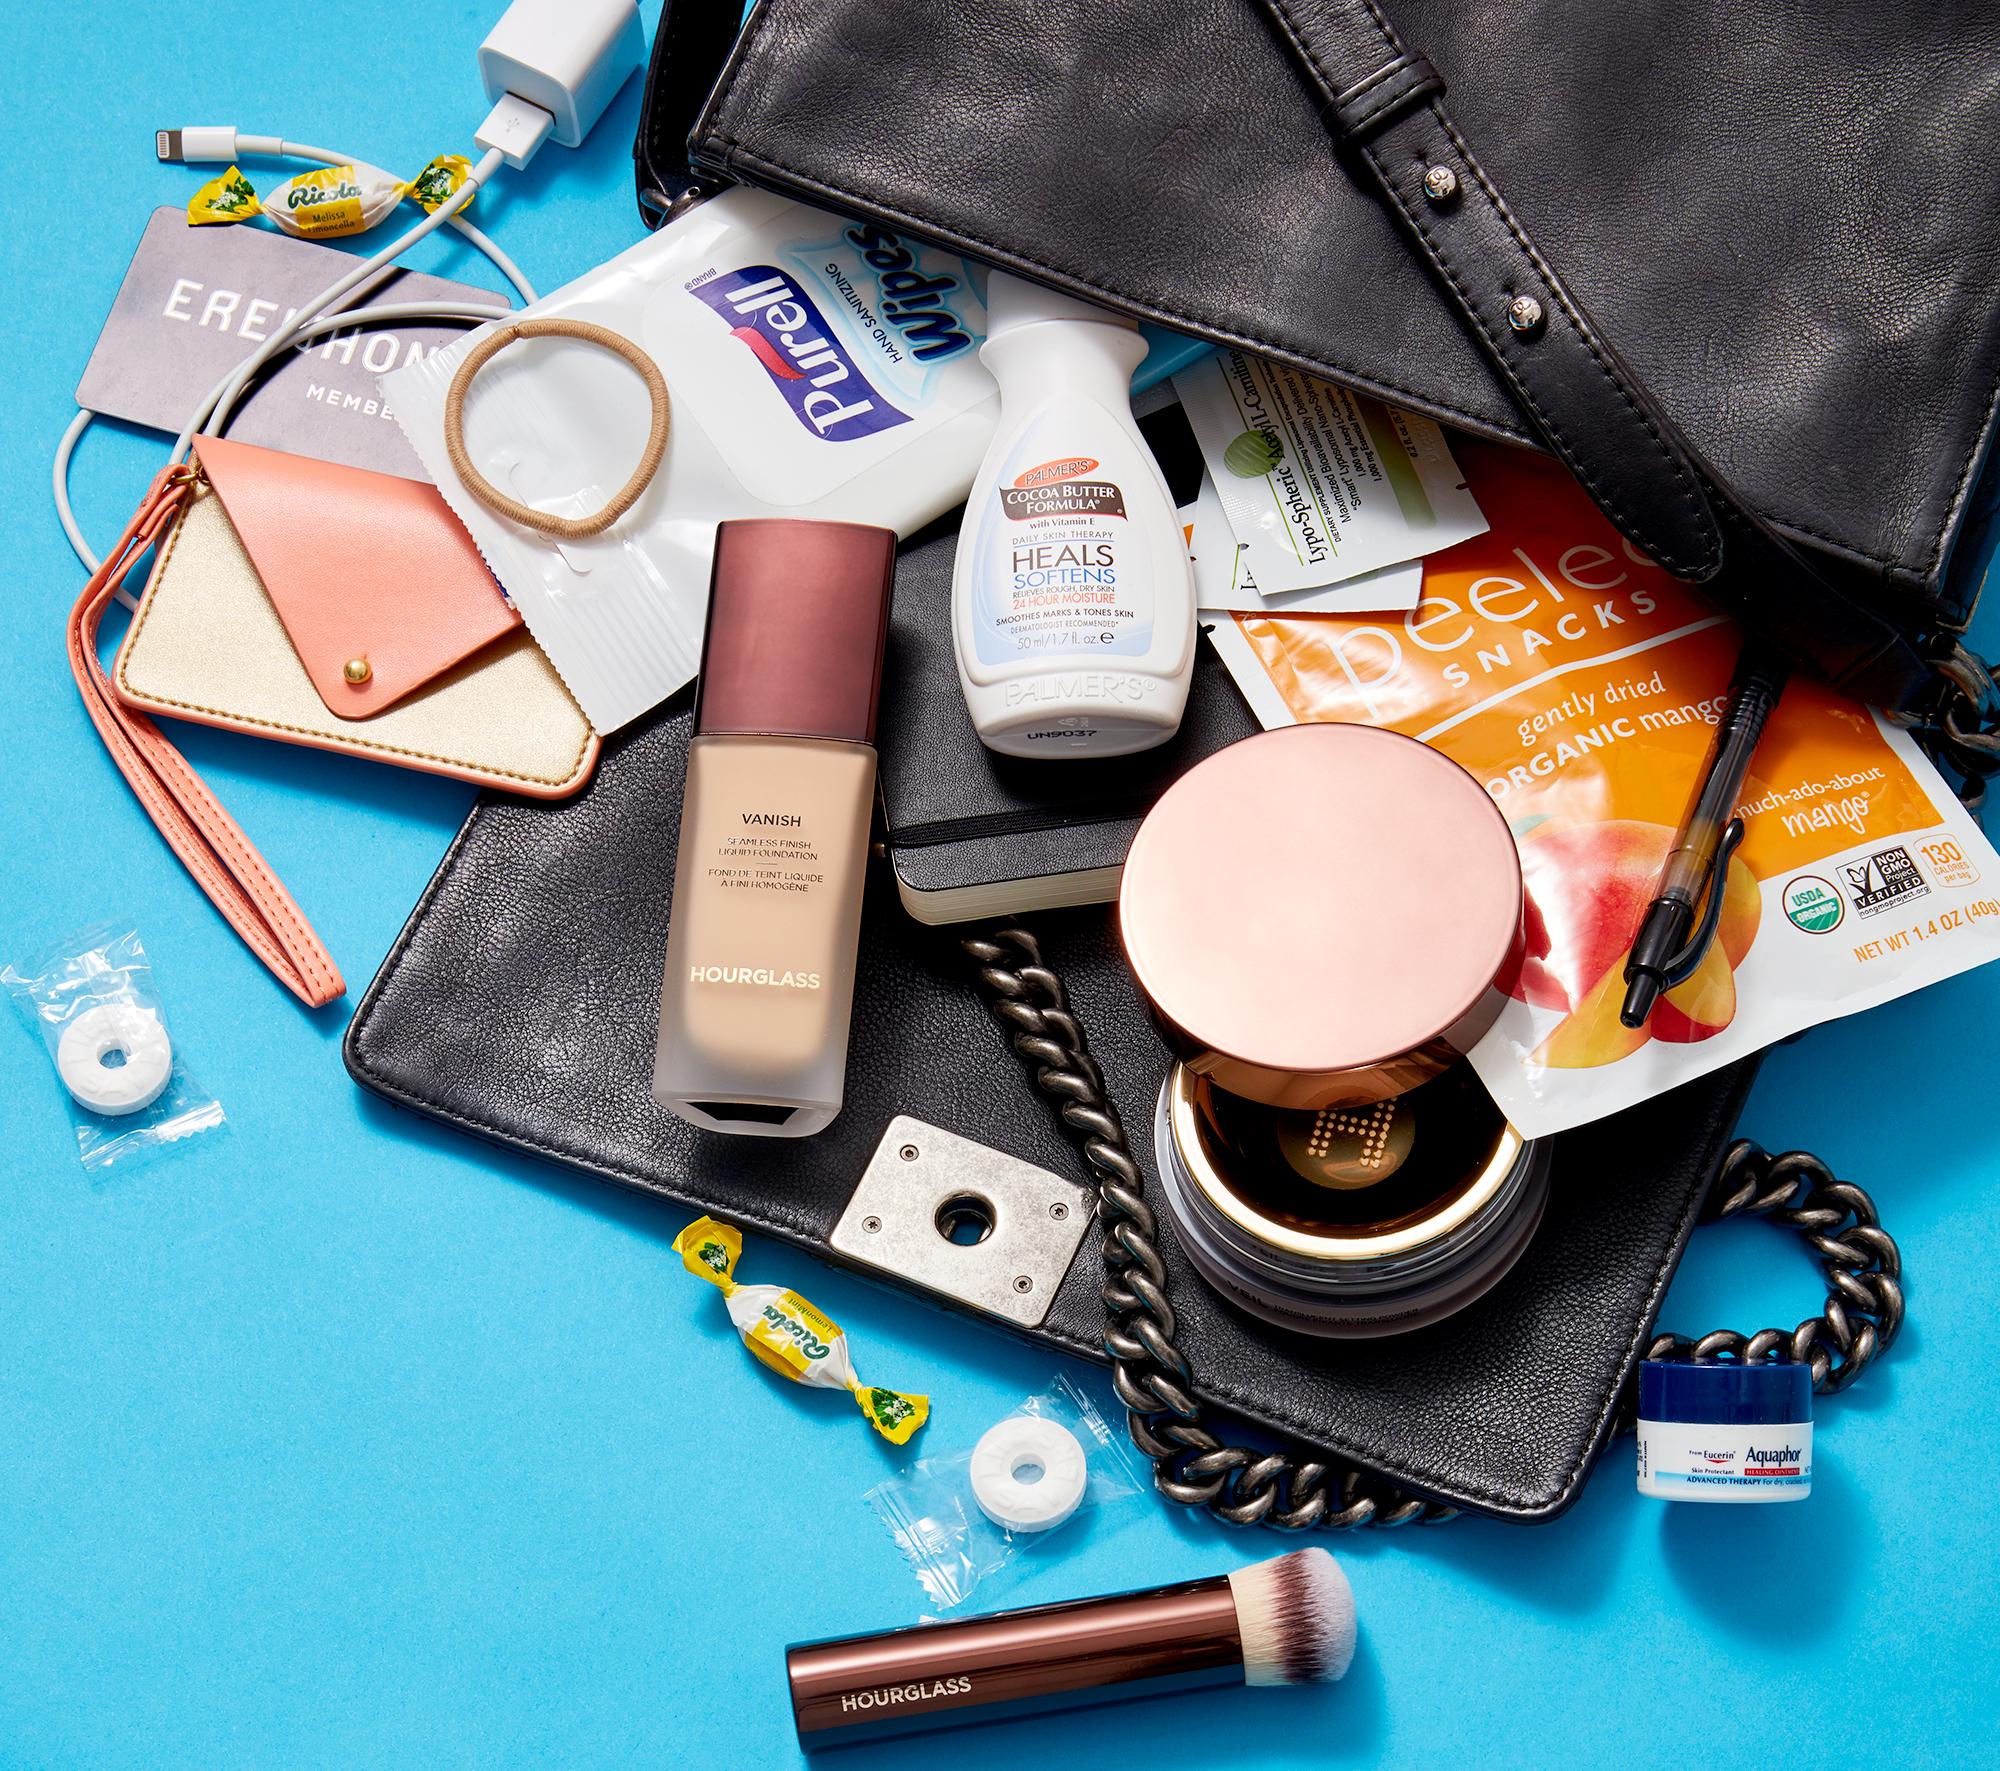 518a43dc45d1 Peta Murgatroyd: What's in My Bag?